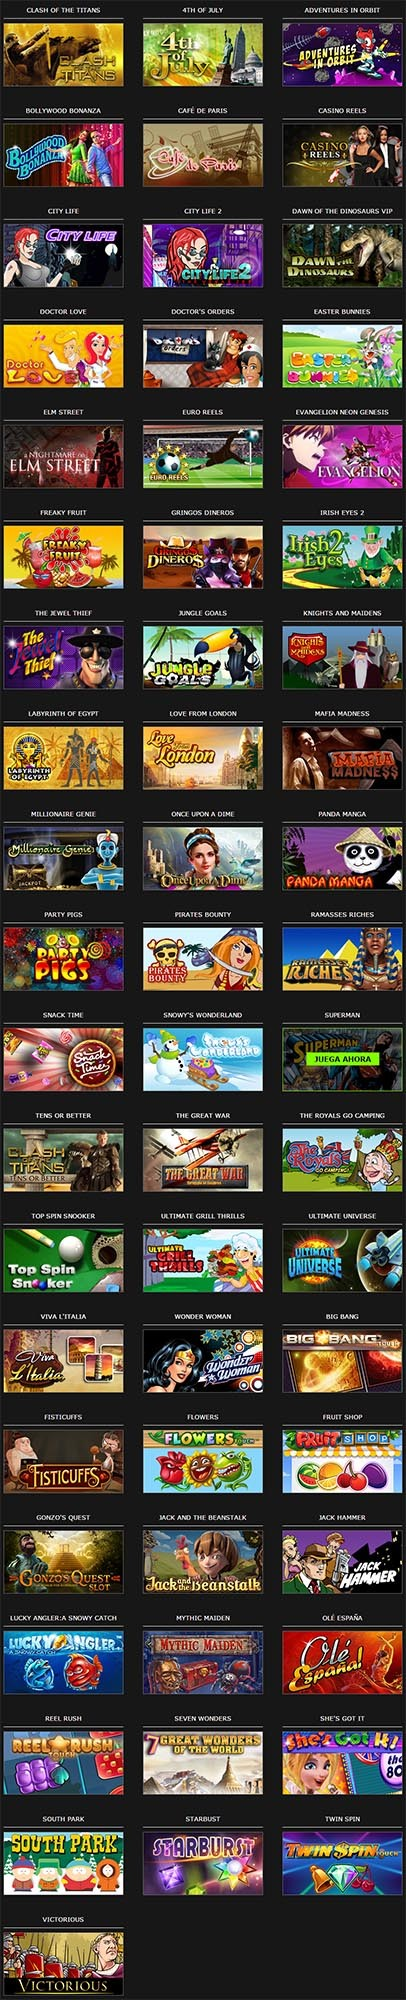 888 casino en vivo opiniones tragaperra Frankenstein-473281